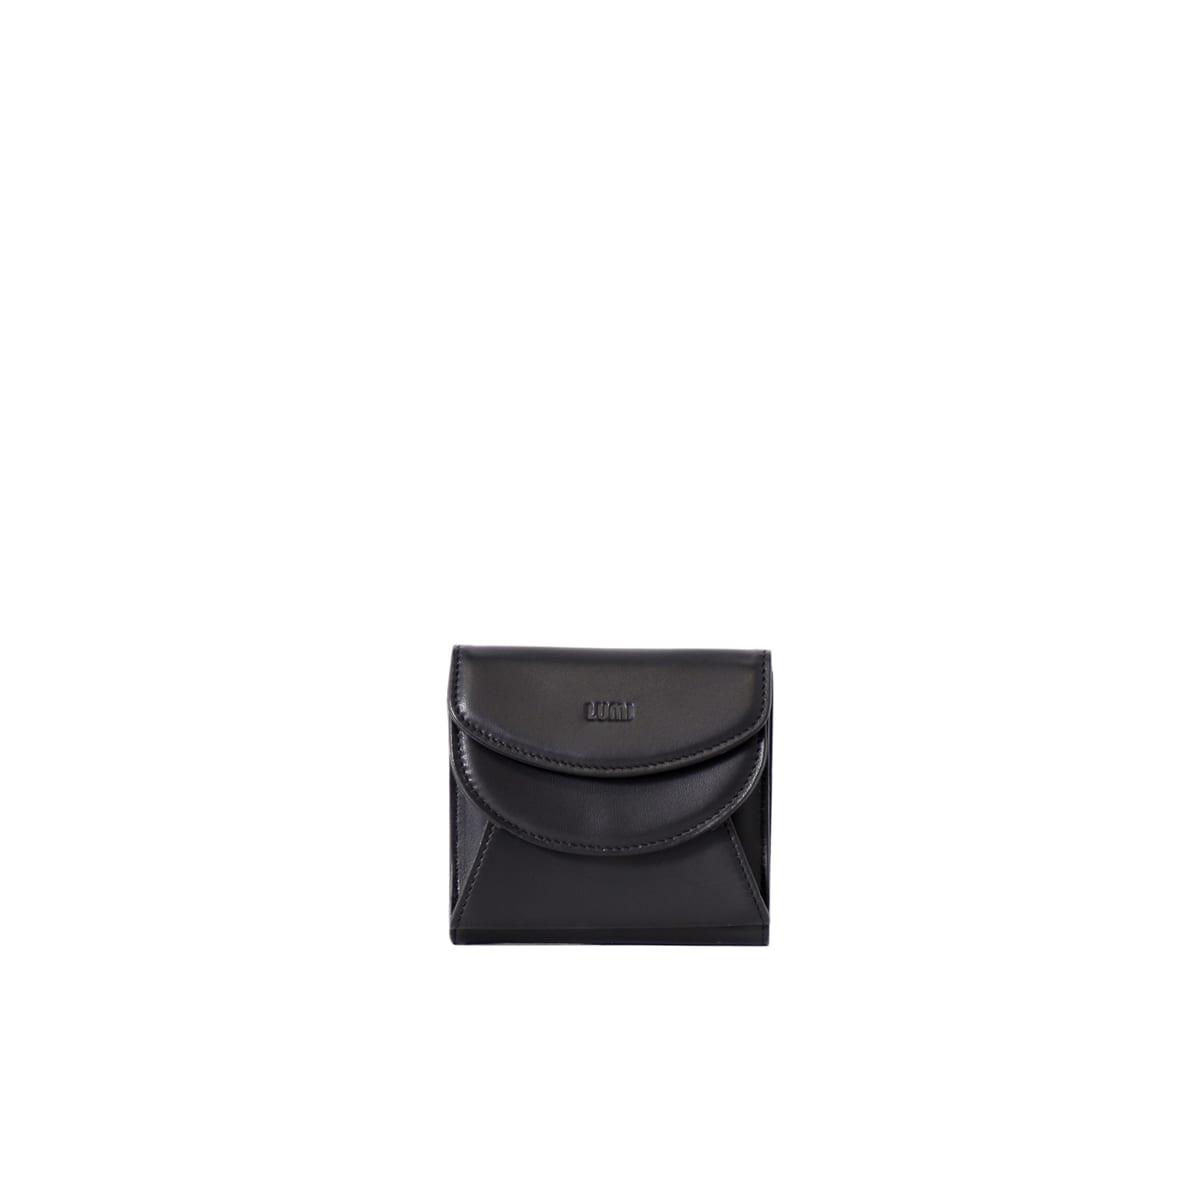 Viivi Trifold Wallet Black